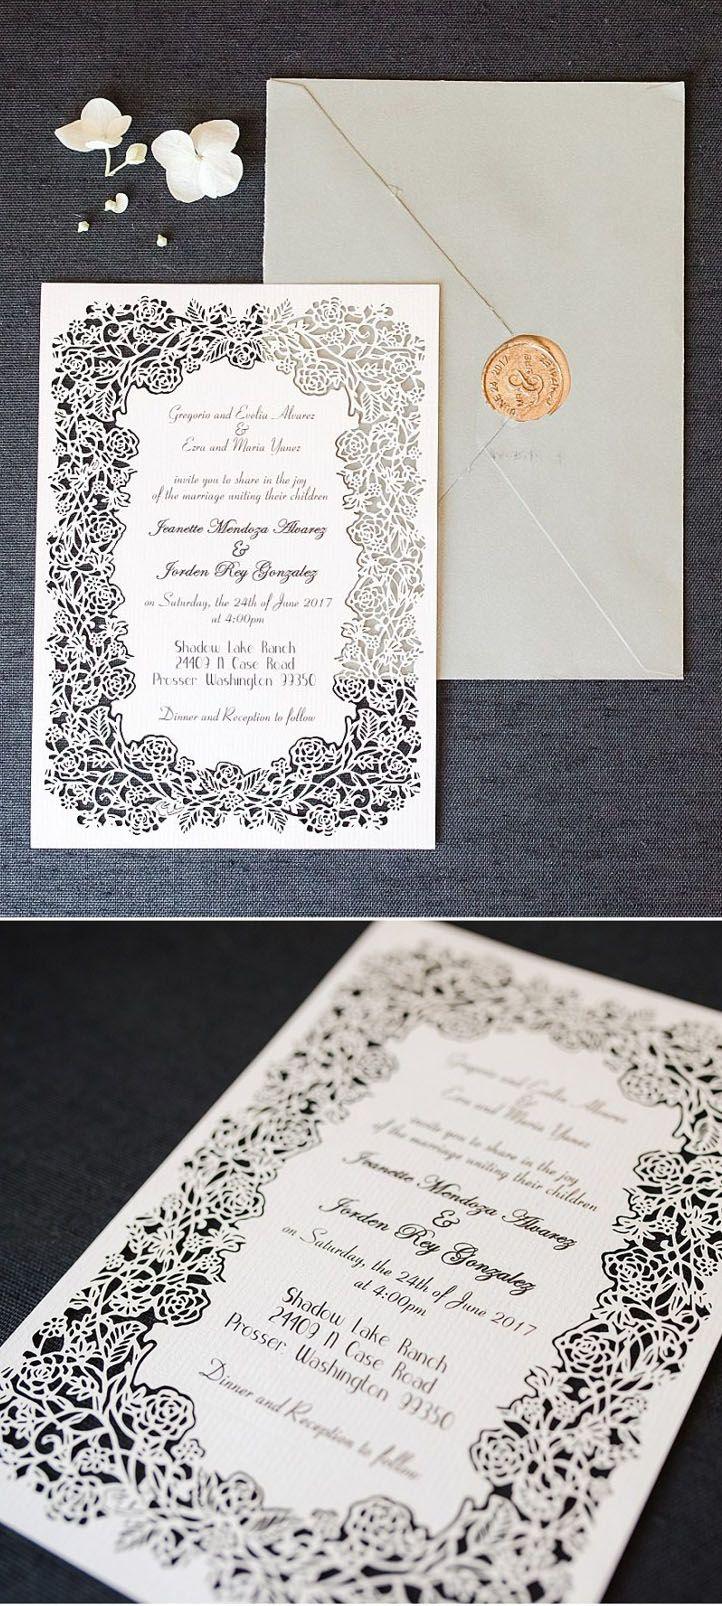 Cheap Blosssom Laser Cut Wedding Invitations Efws003 Laser Cut